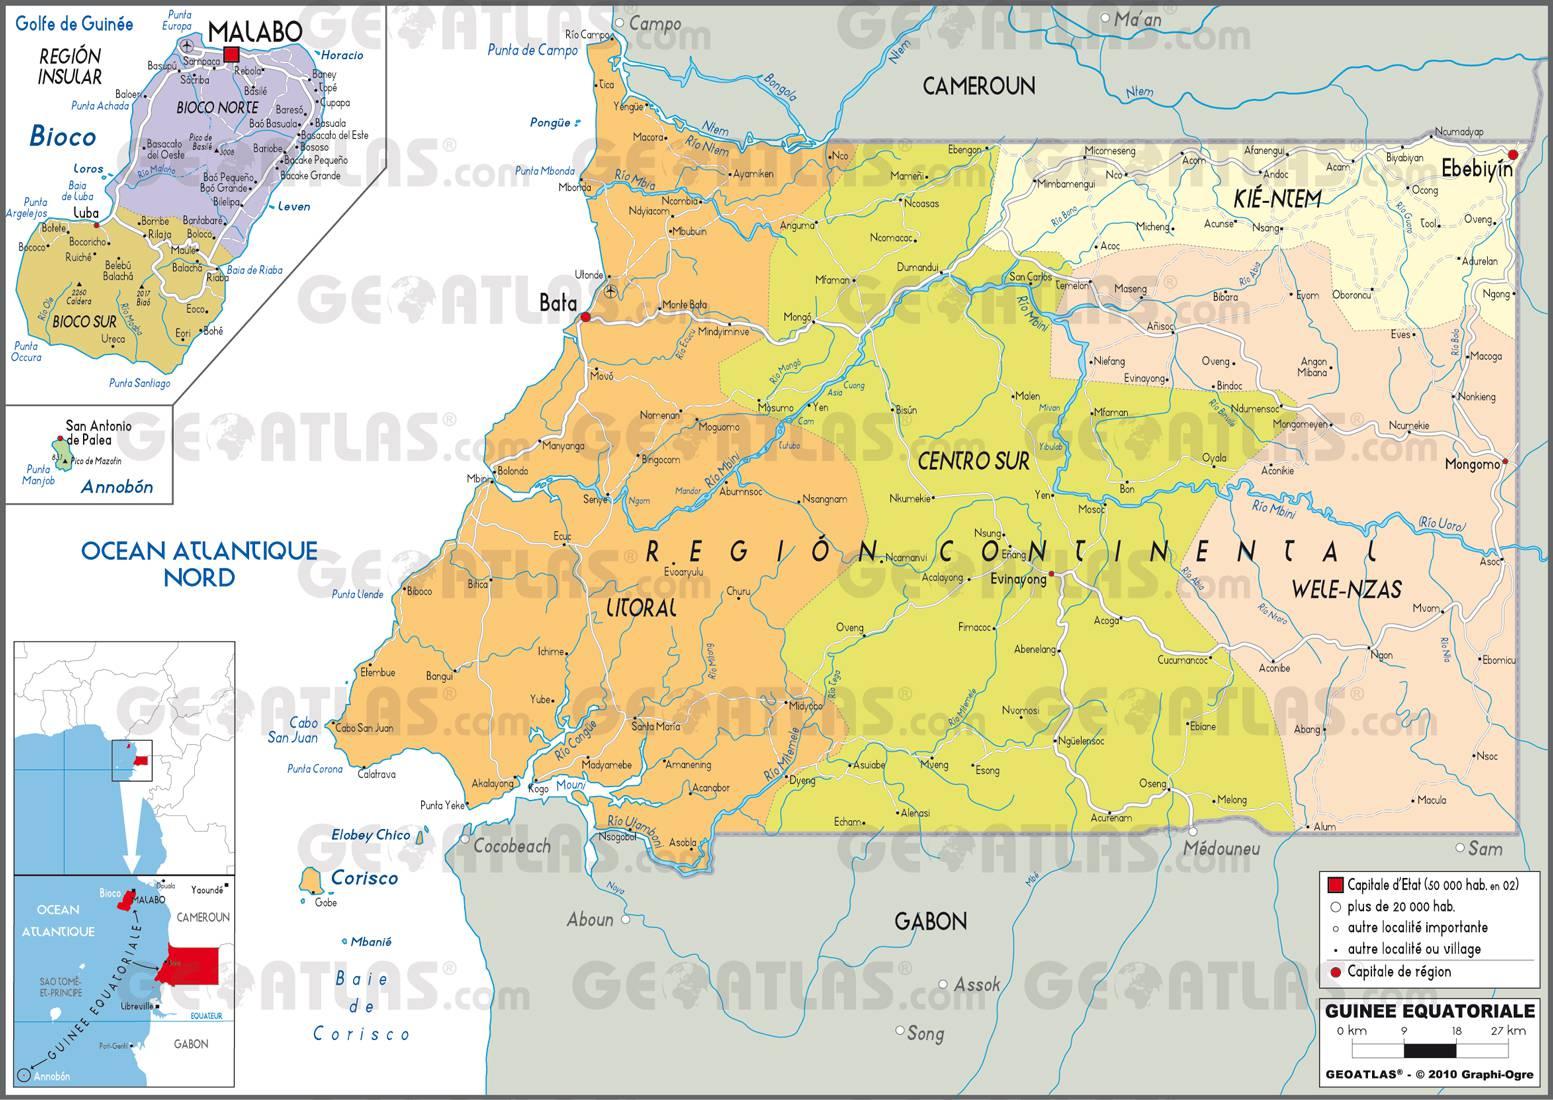 Carte administrative de la Guinée-Equatoriale